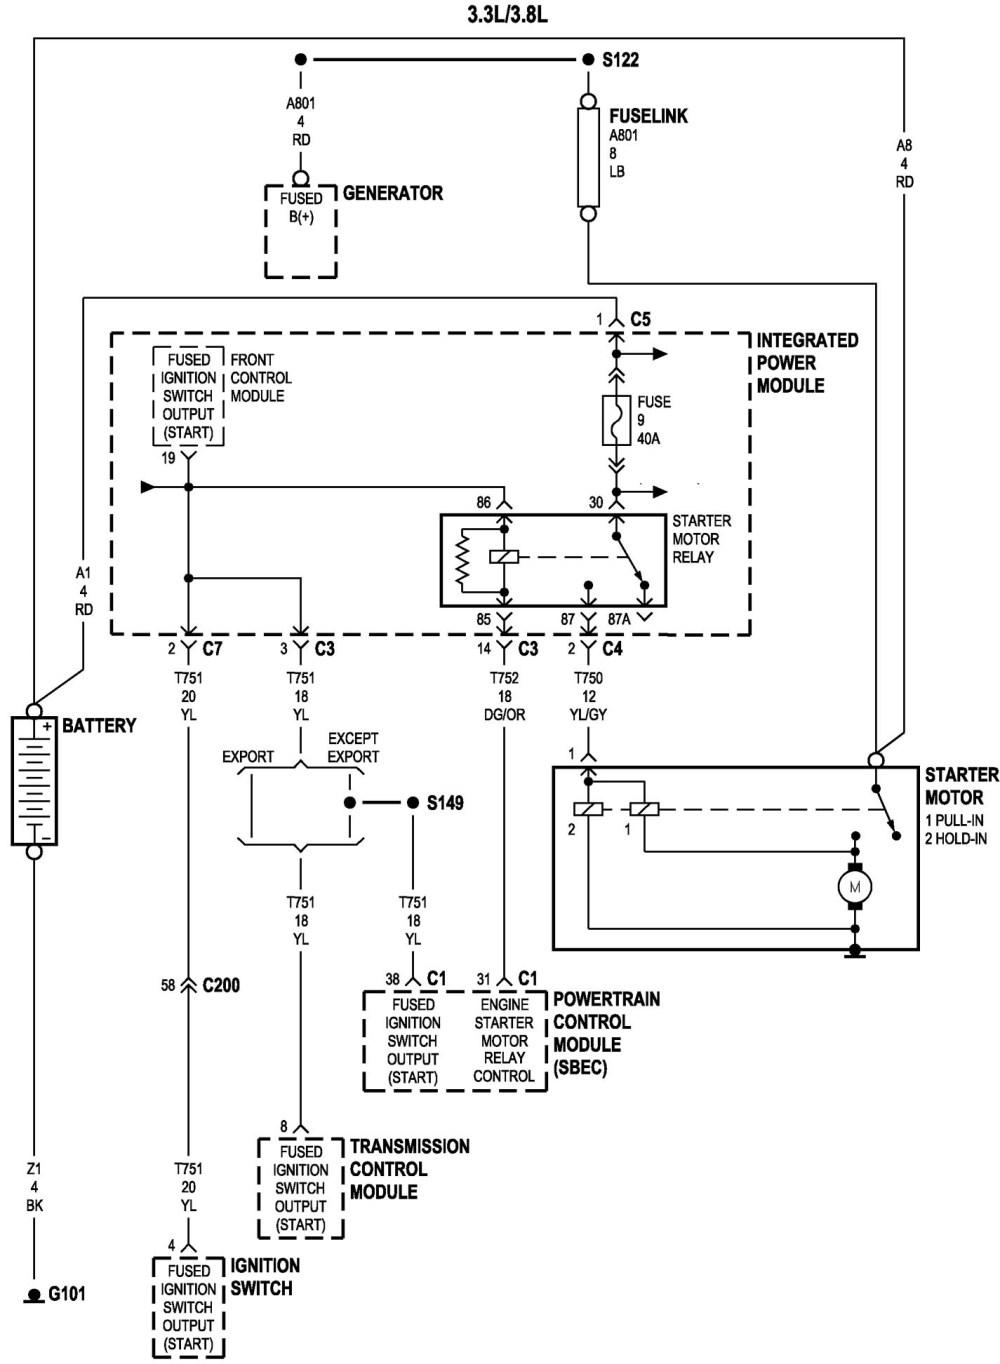 medium resolution of 2006 dodge grand caravan engine diagram beautiful 2002 dodge caravan wiring diagram ideas everything you of